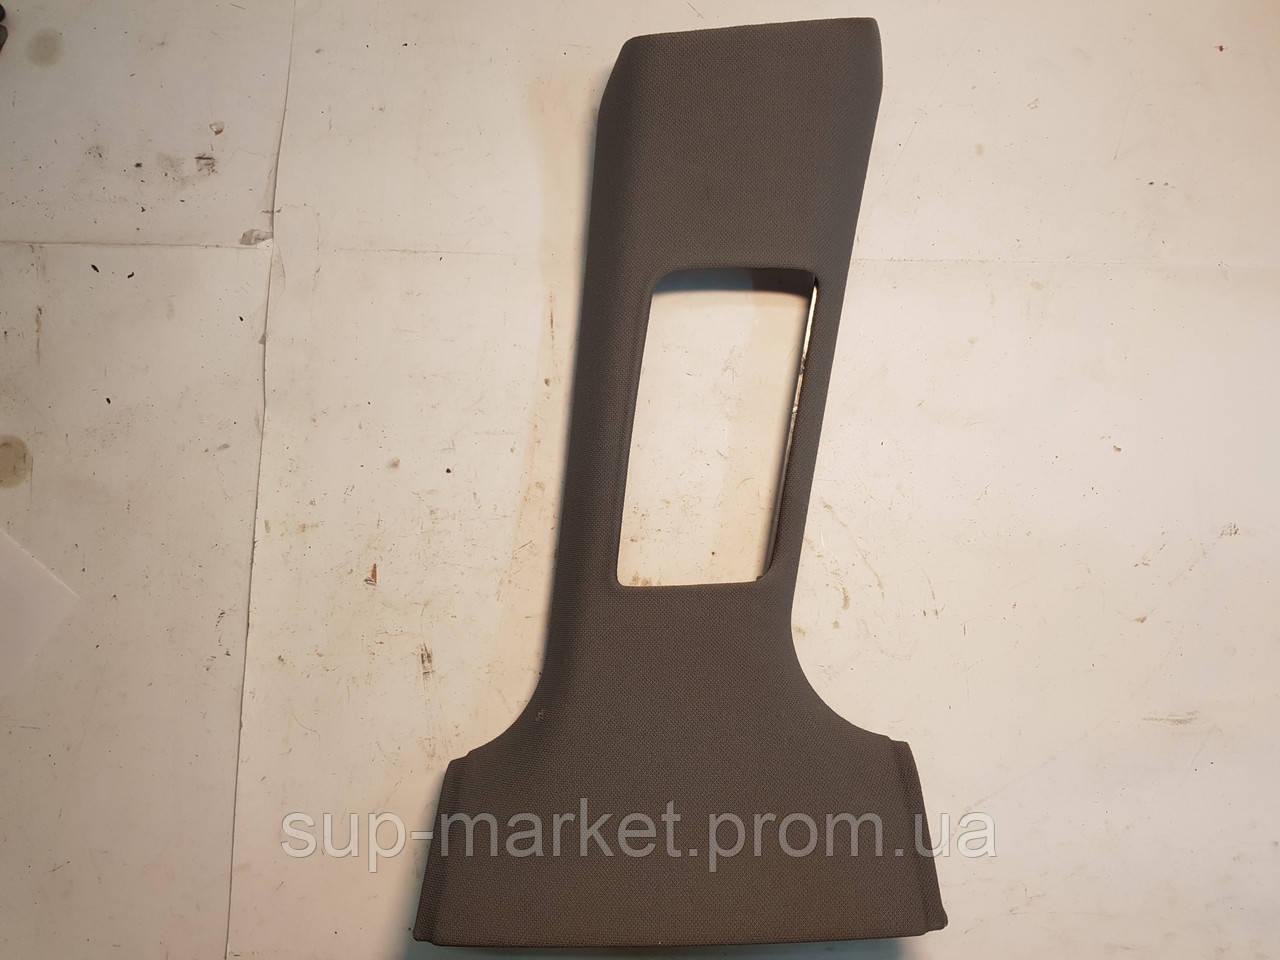 4B0867244E Внутренняя средняя обшивка правая верхняя для VAG A6 C5 2.5TDI 1997-2004